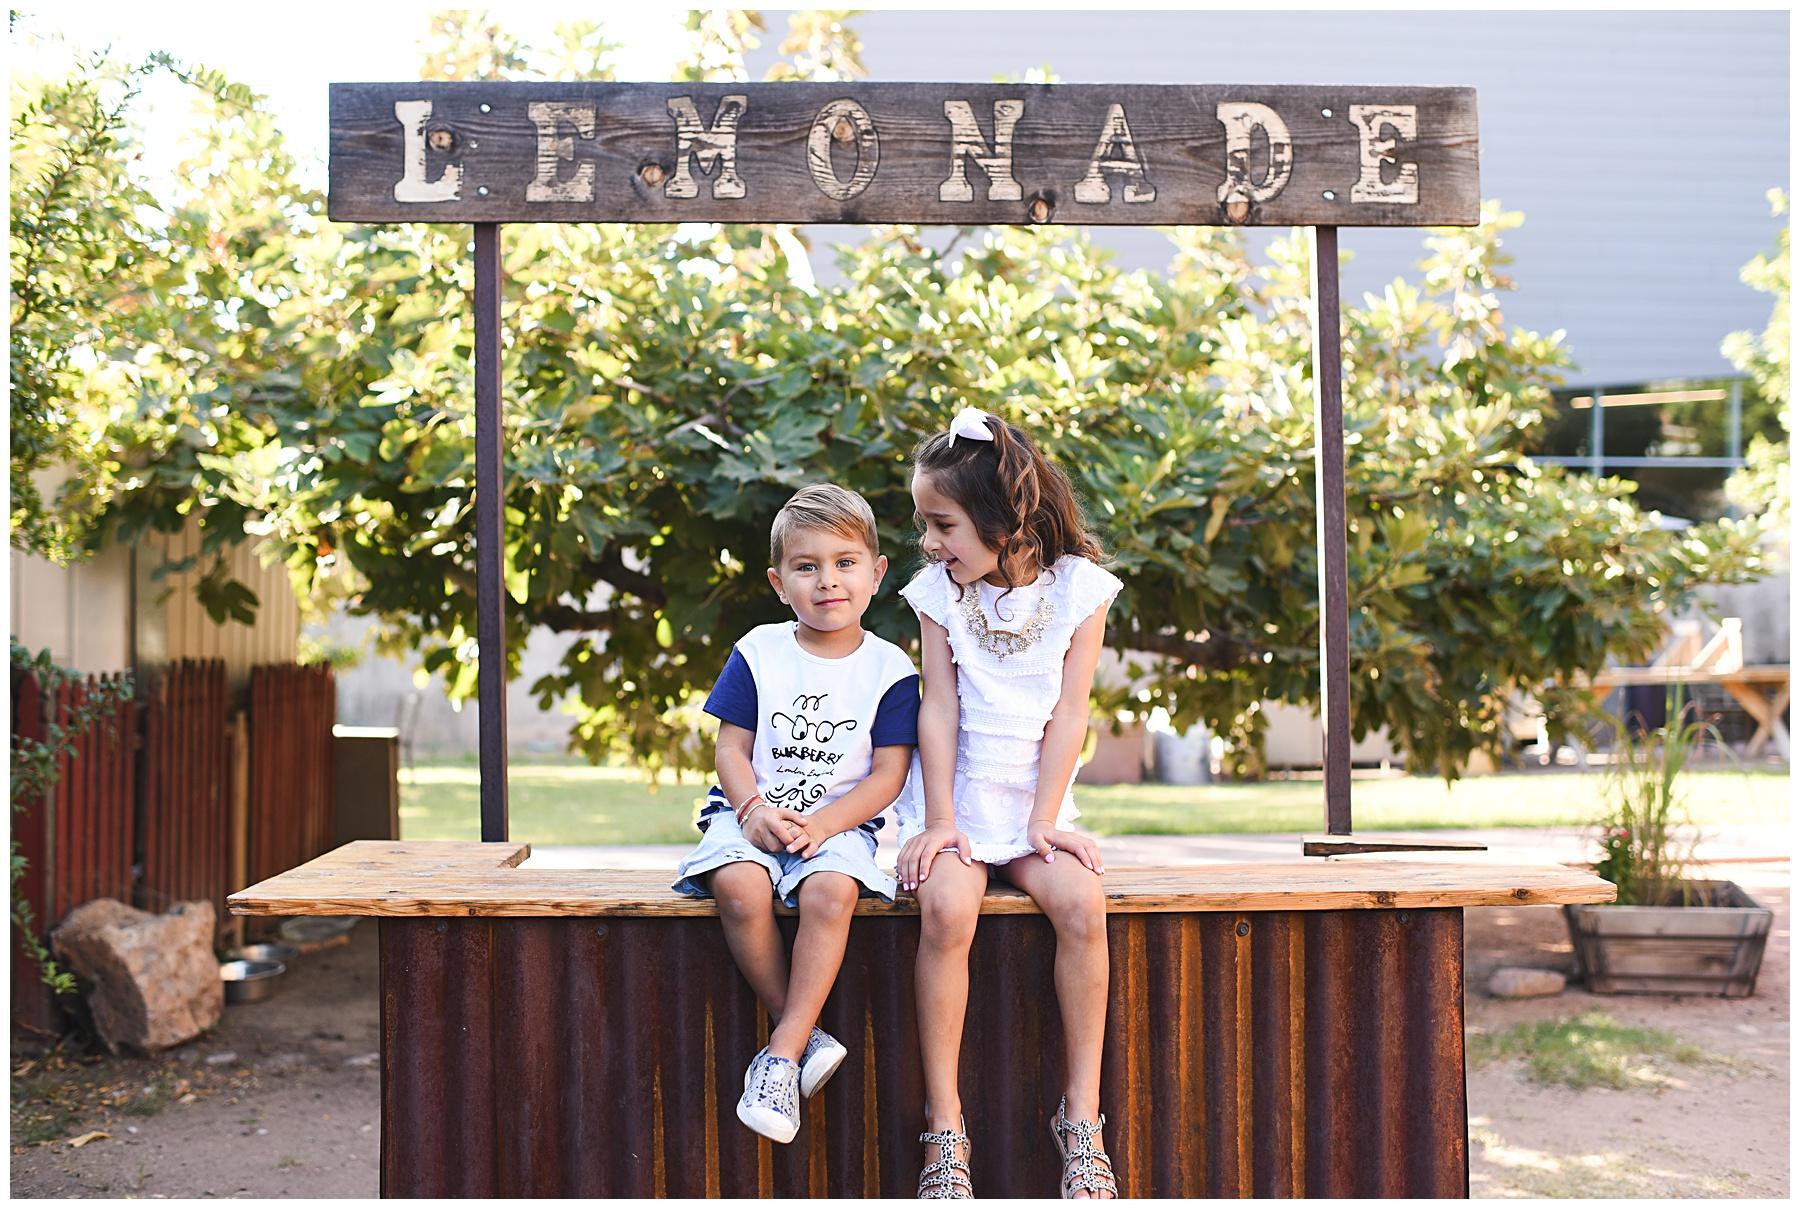 Lemonade Stand Child photographer   Sweetlife Photography